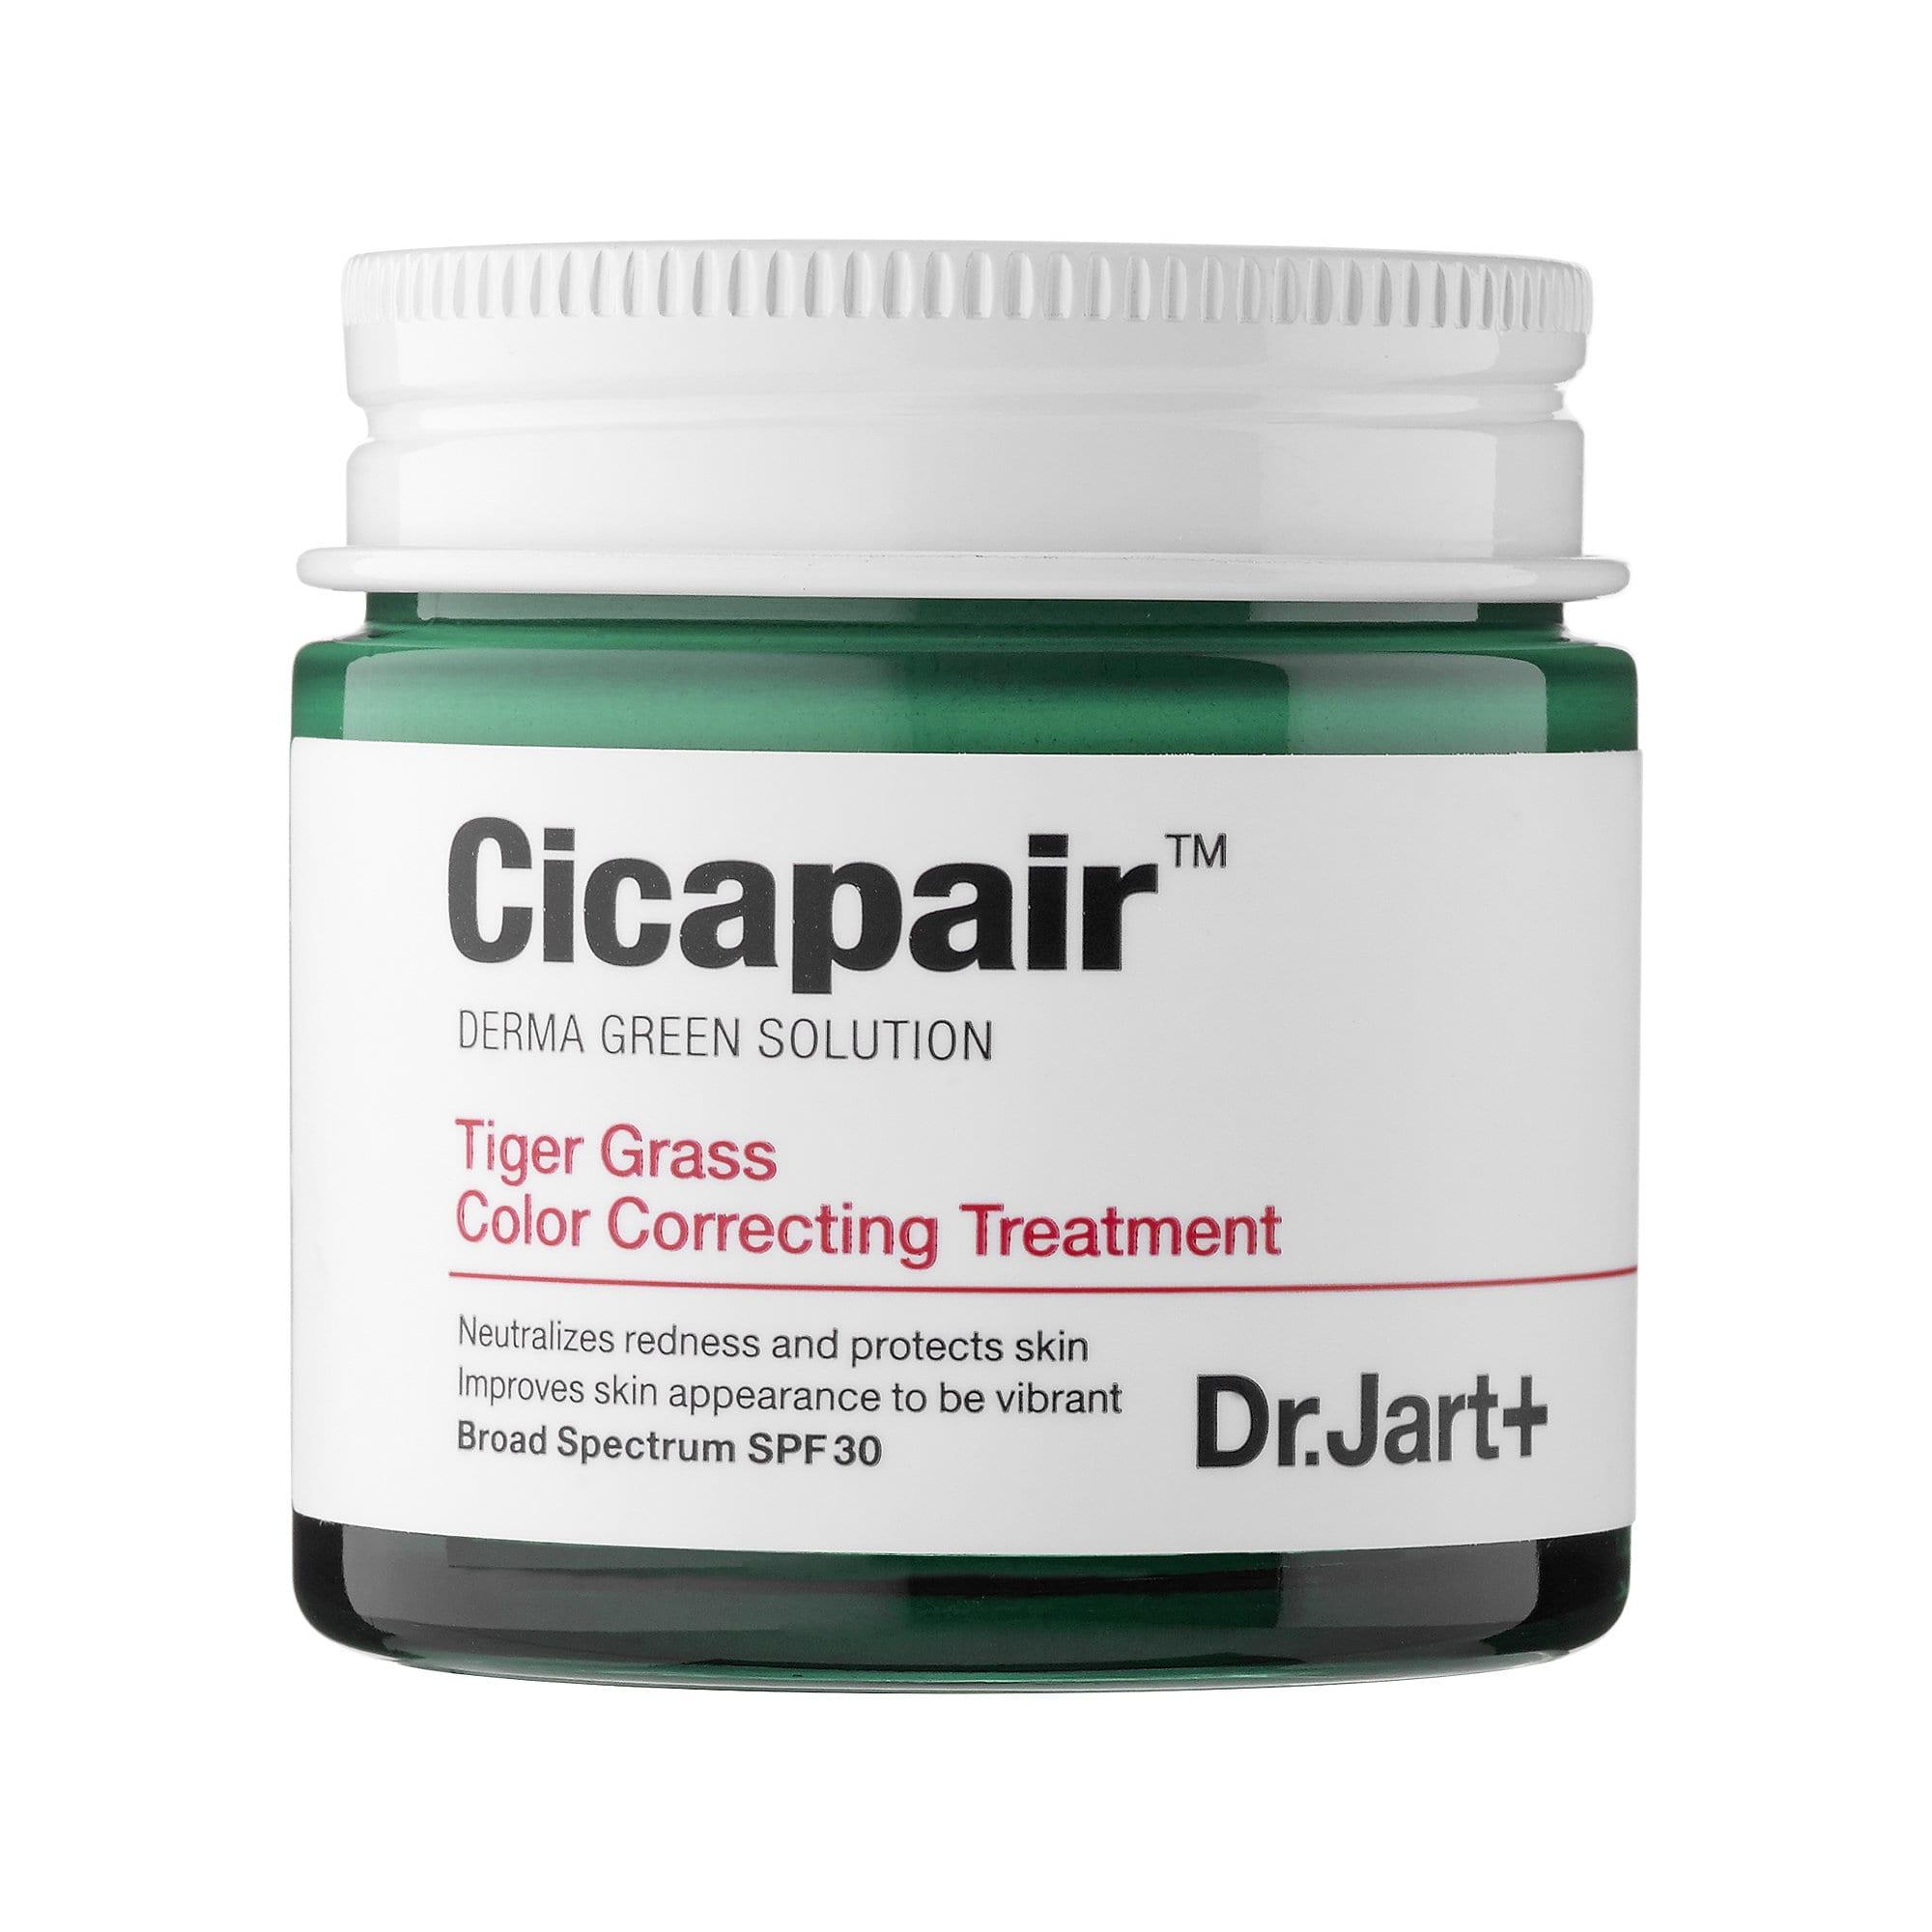 cicapair-tiger-grass